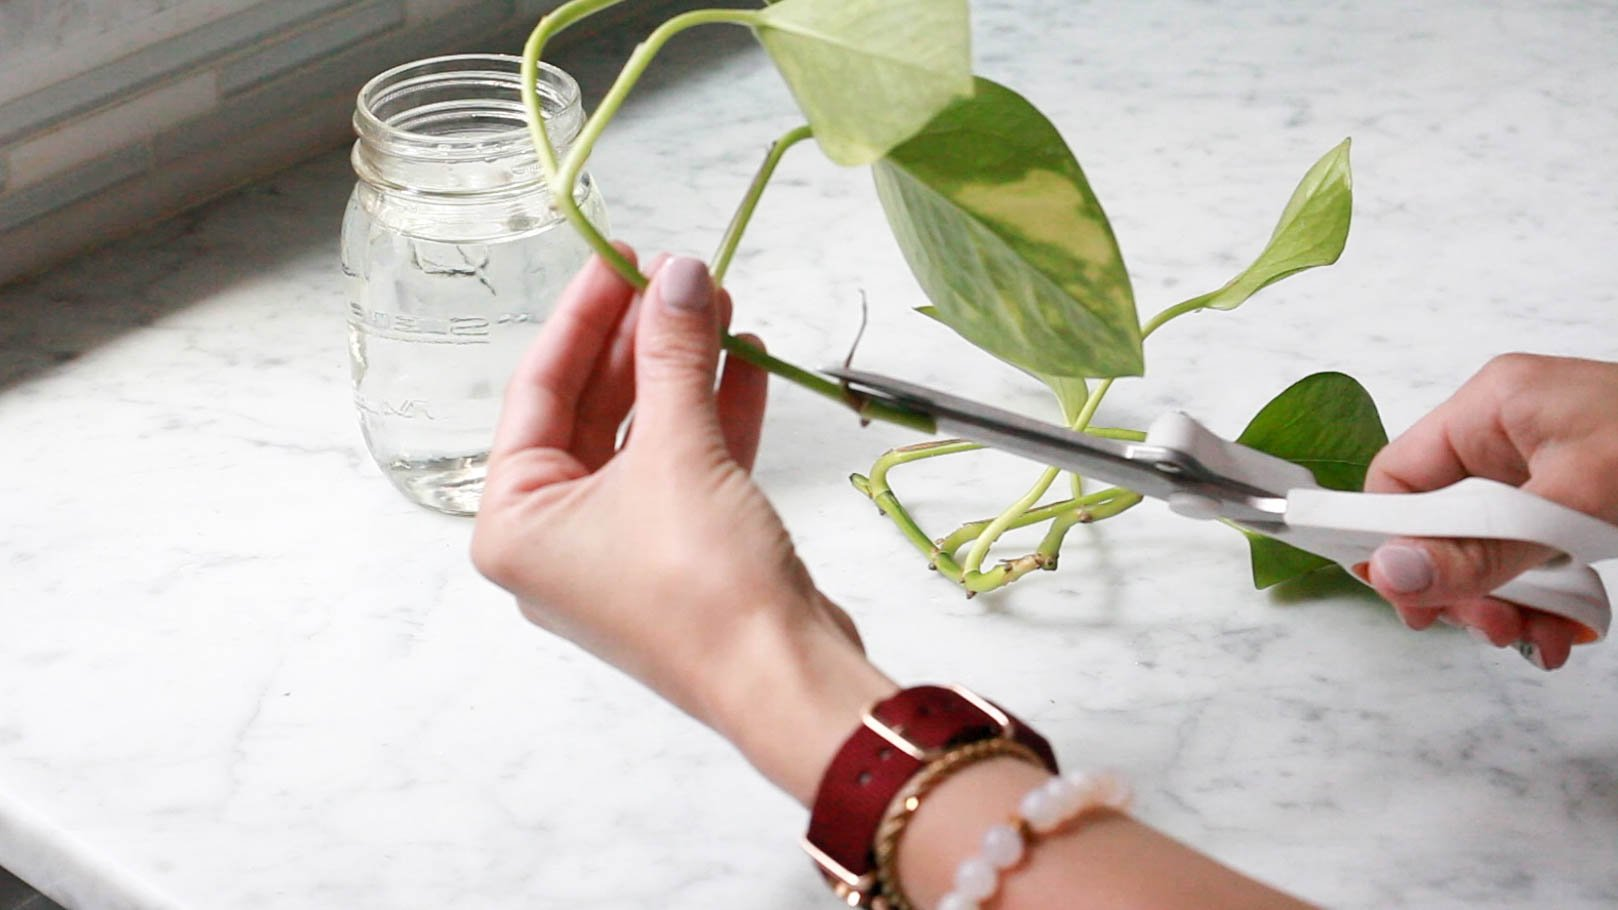 trimming pothos plant stem